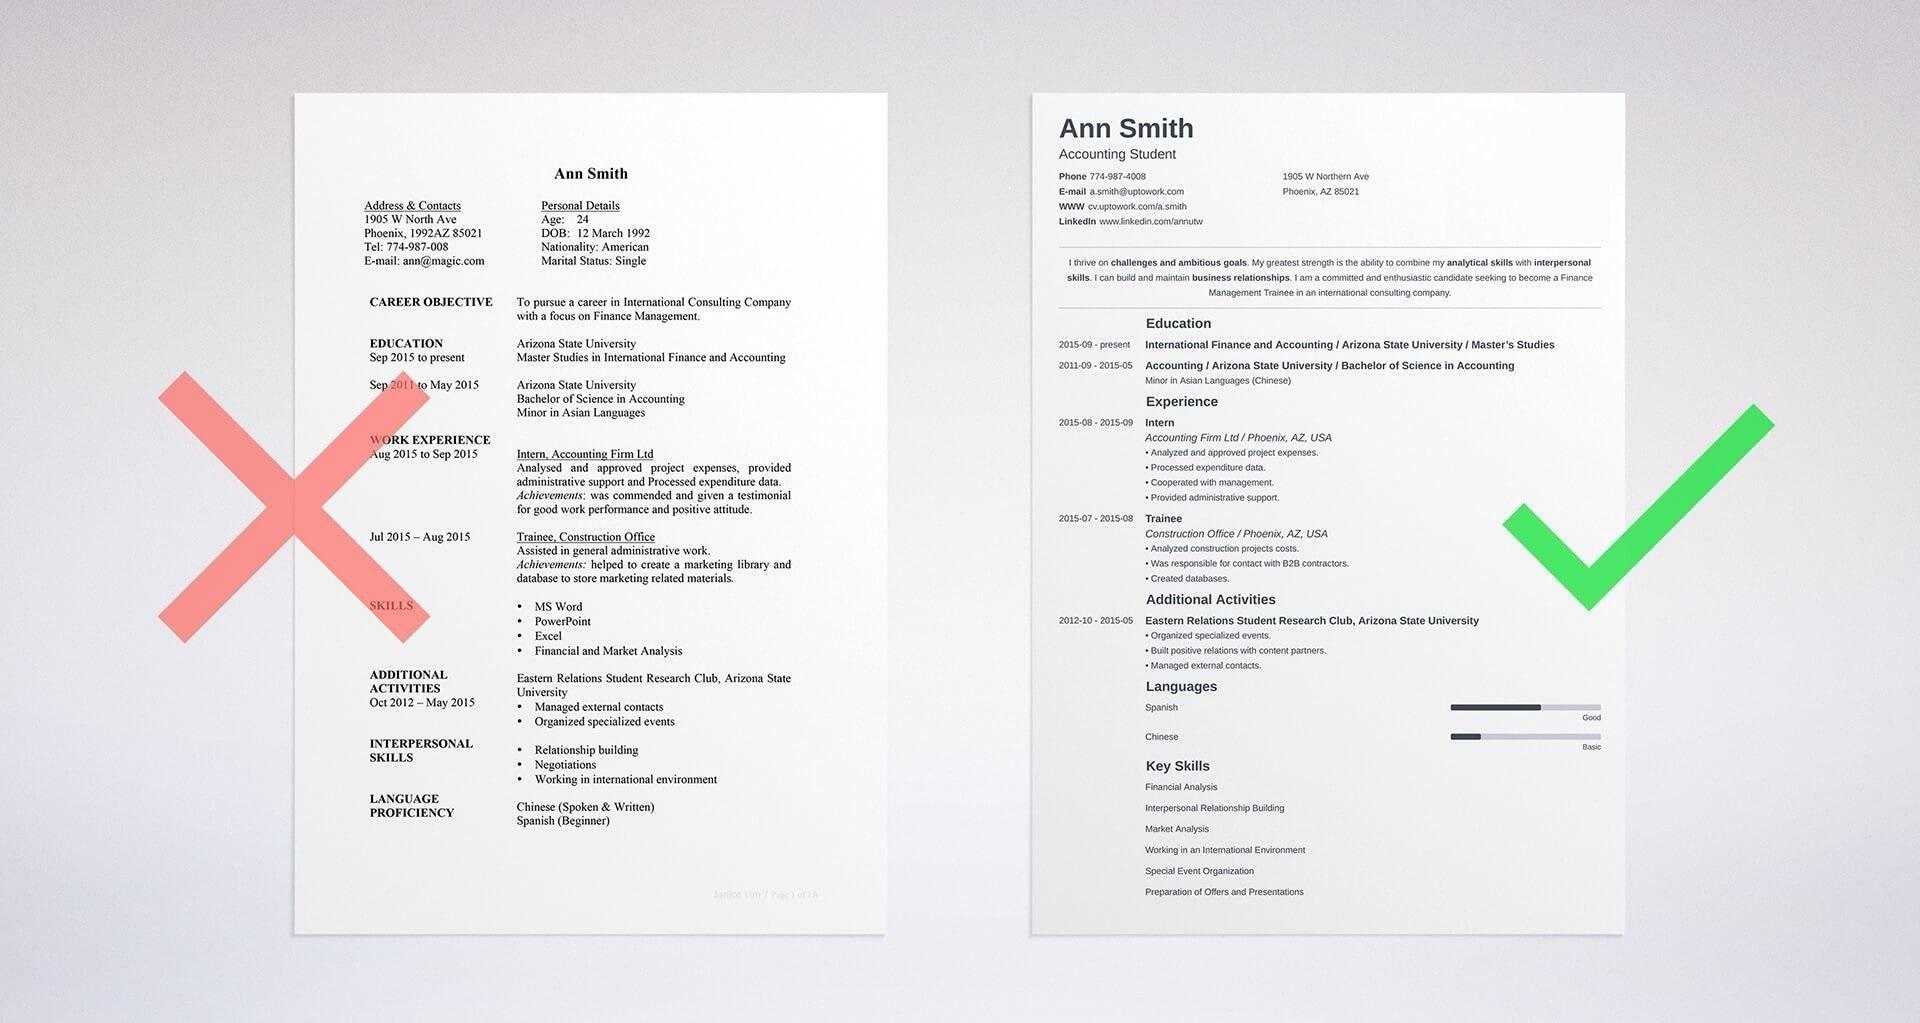 Resume Format Uptowork Resume examples, Resume objective